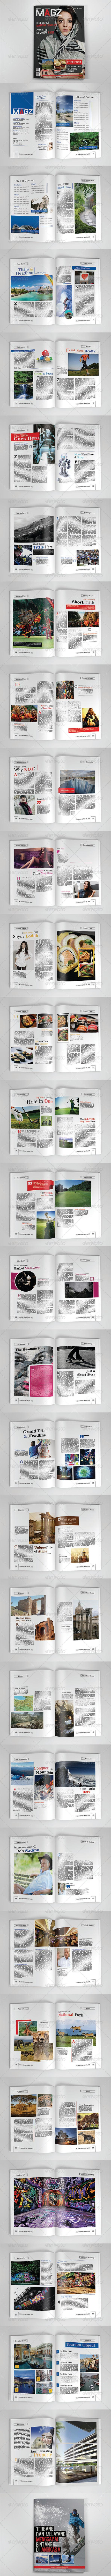 A4 Magazine Template Vol.2 - Magazines Print Templates